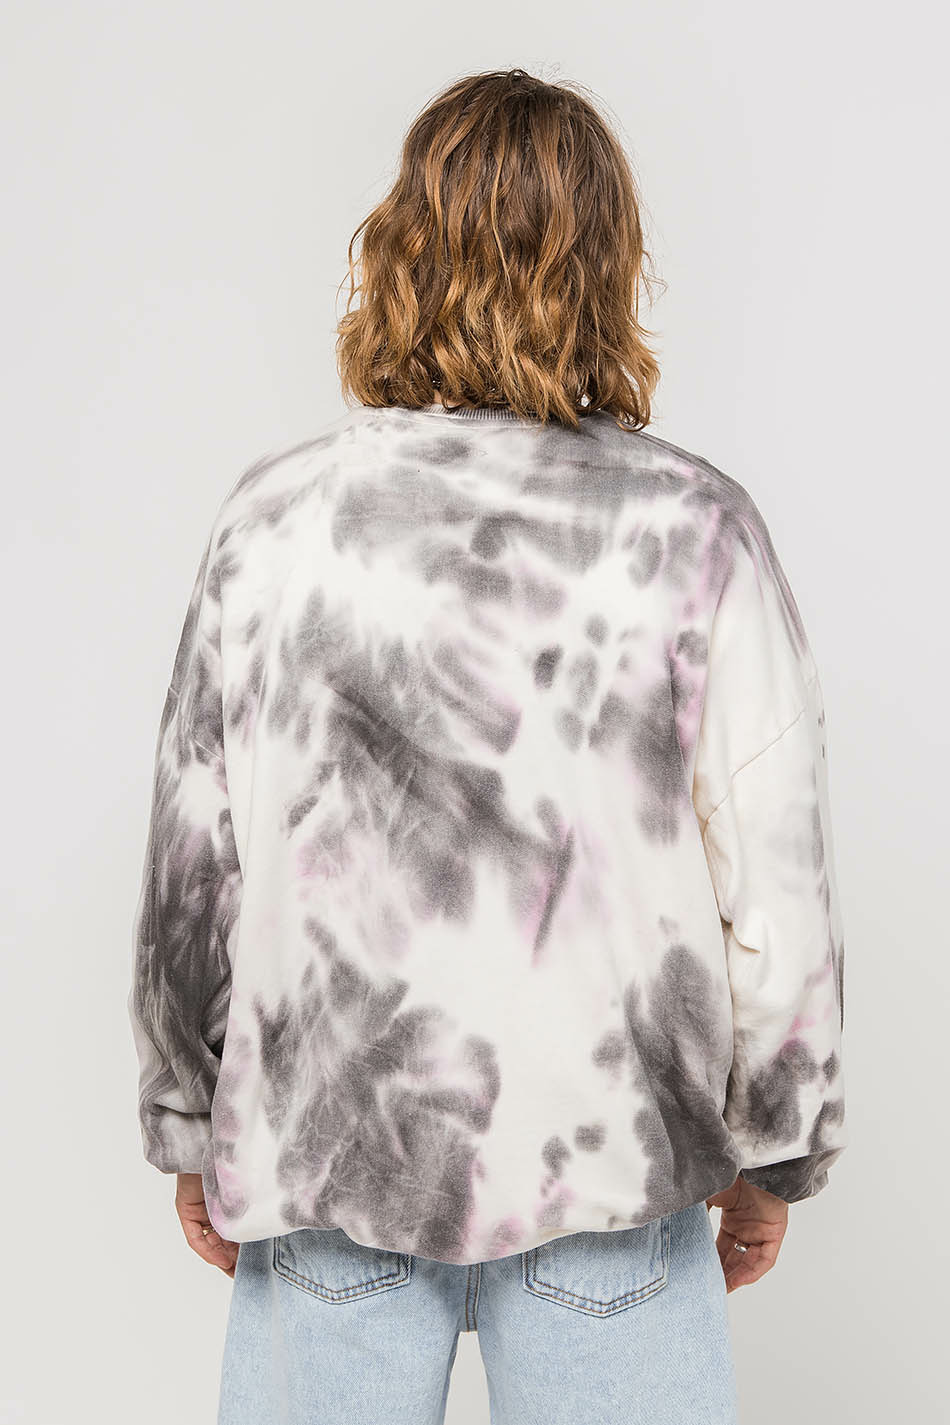 Tie Dye Black / White Sweatshirt